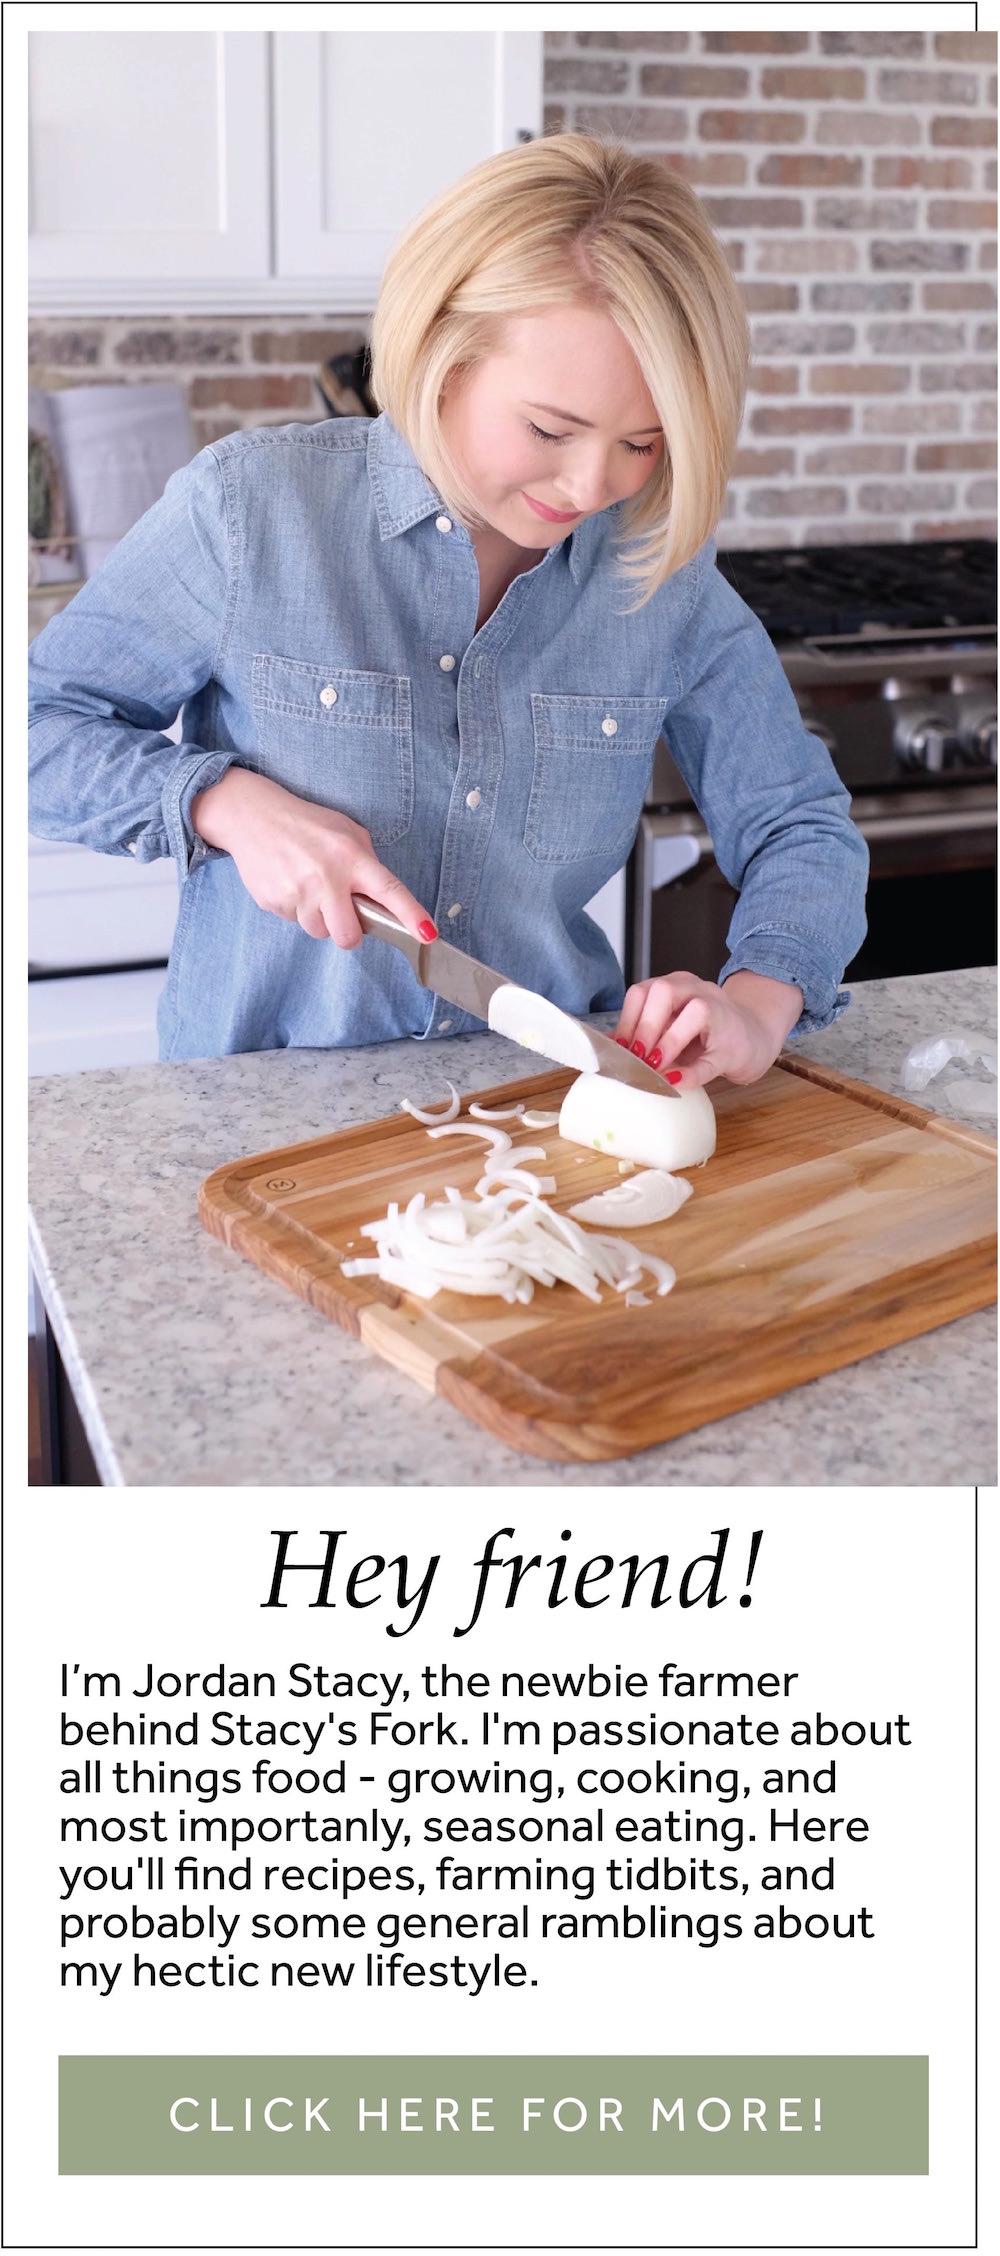 Jordan Stacy chopping onions for a seasonal recipe.jpg